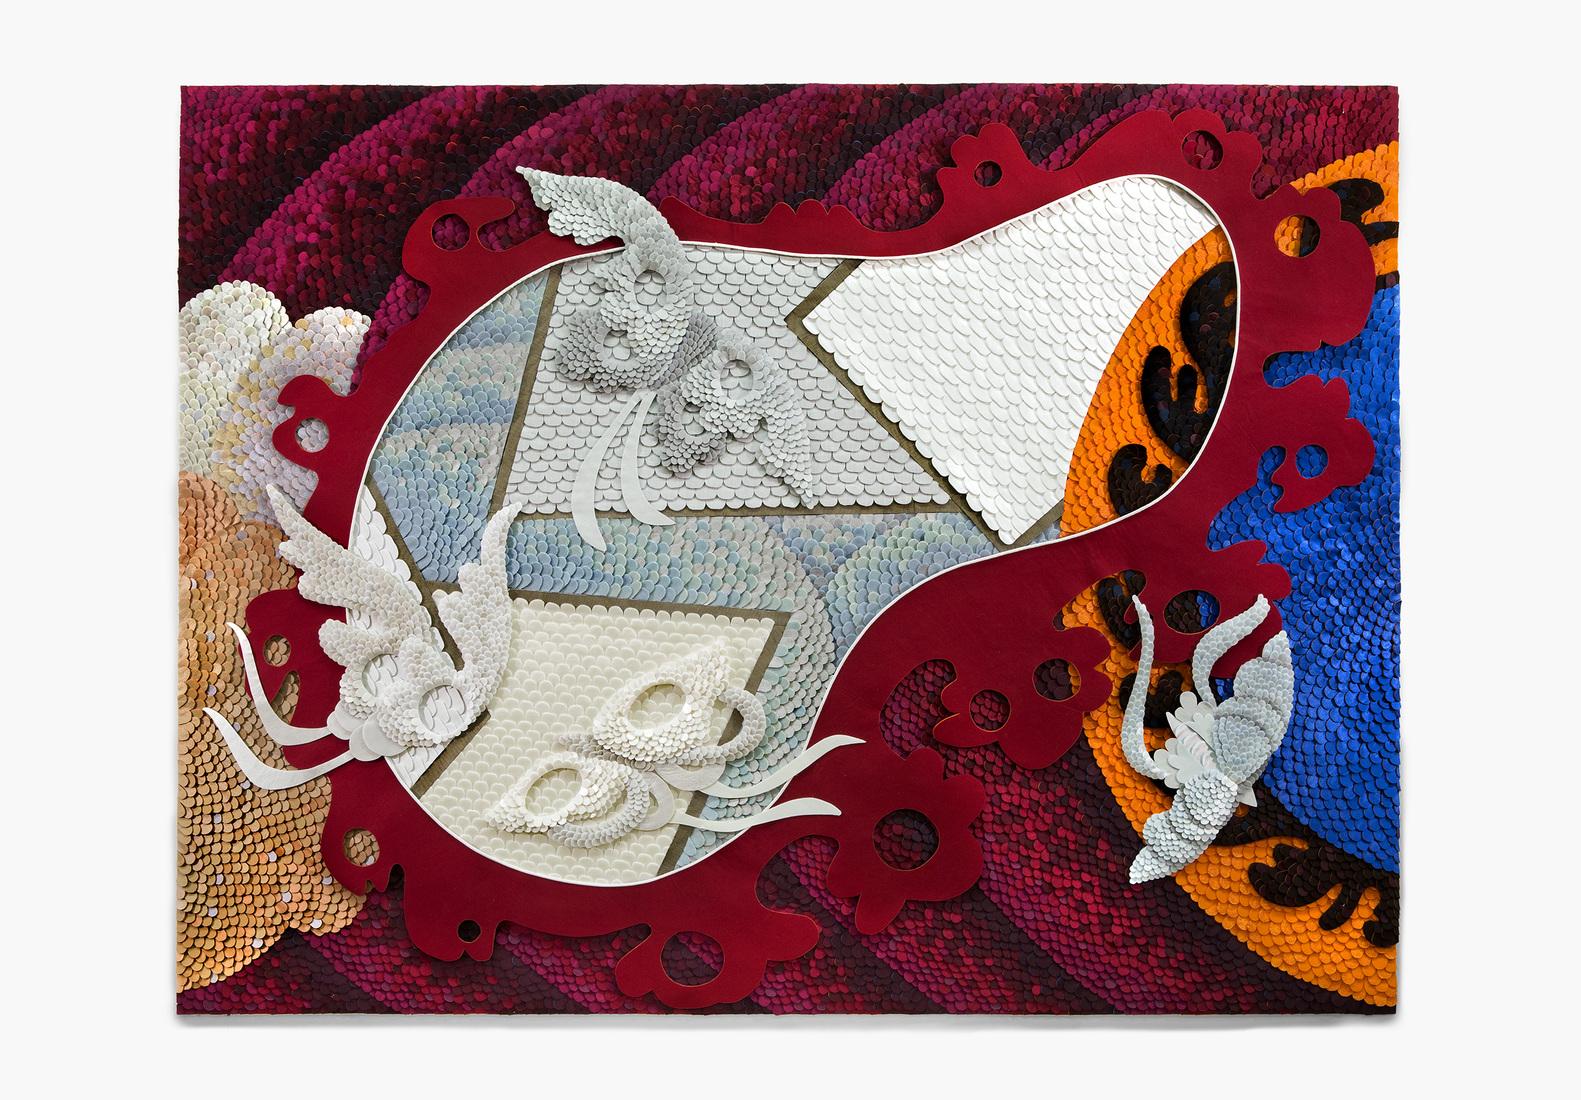 GERHARDT KNODEL Minglings: A Journey Across Time: 2015-2017 Eclipse, 2015-2017, 51 x 67 x 2 in.